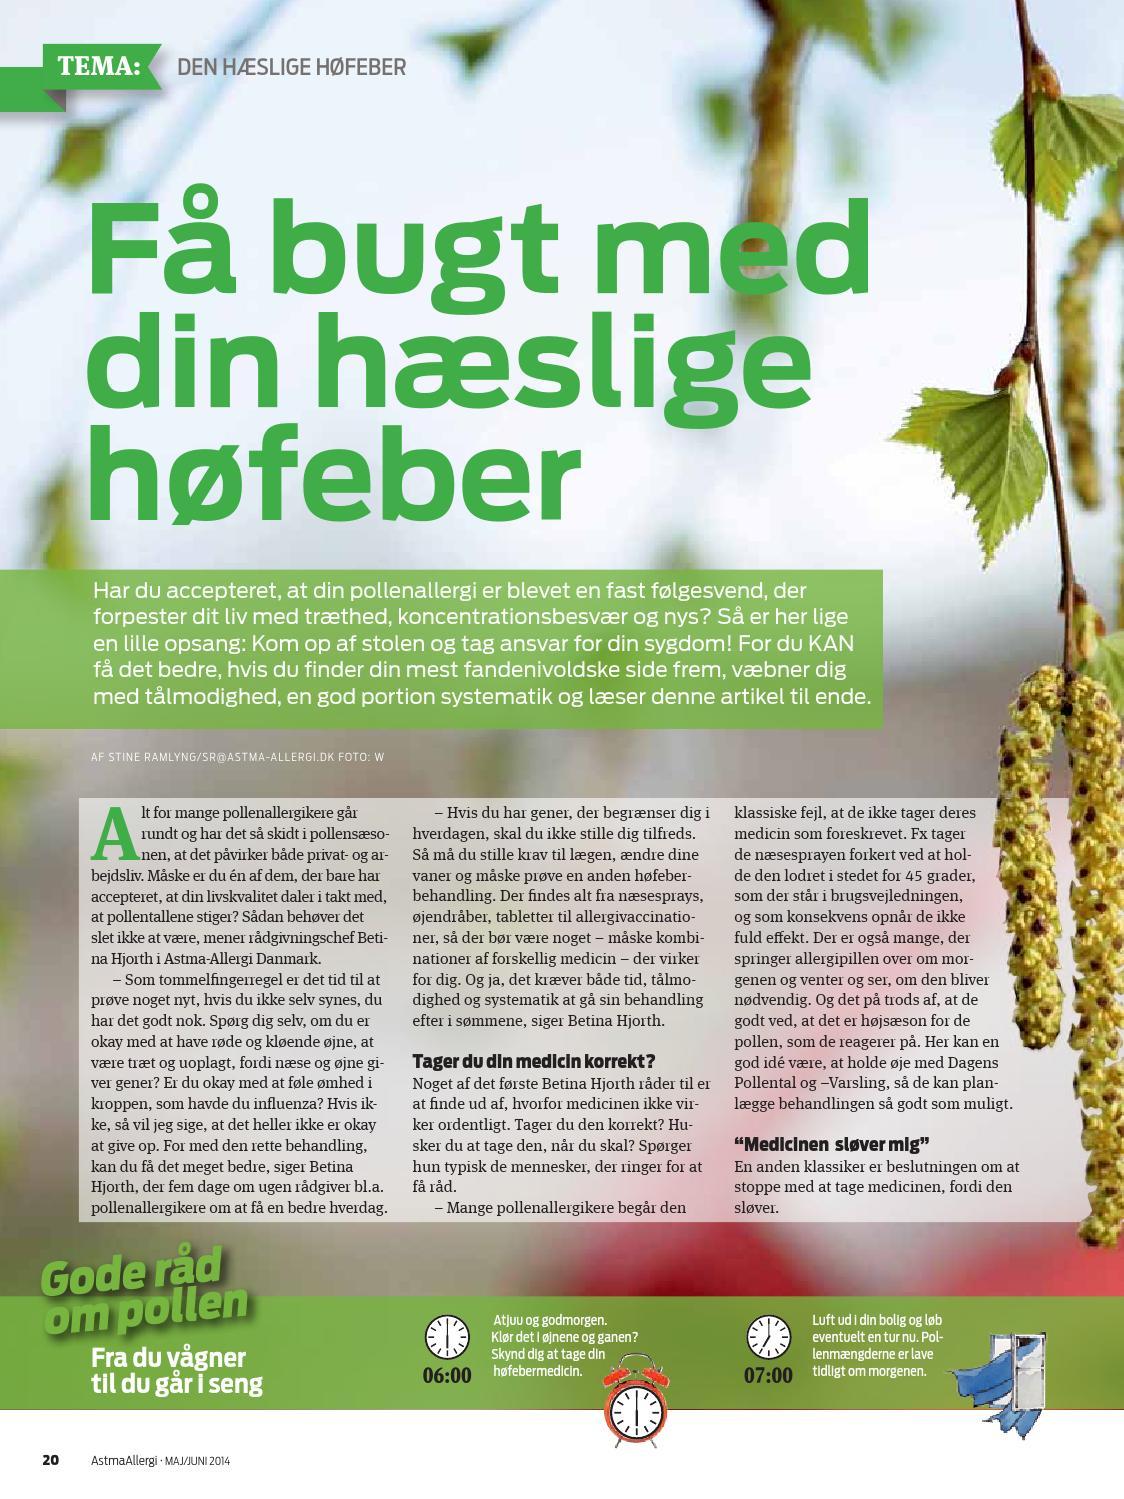 Høfebermedicin 2014 by Astma-Allergi Danmark - Issuu